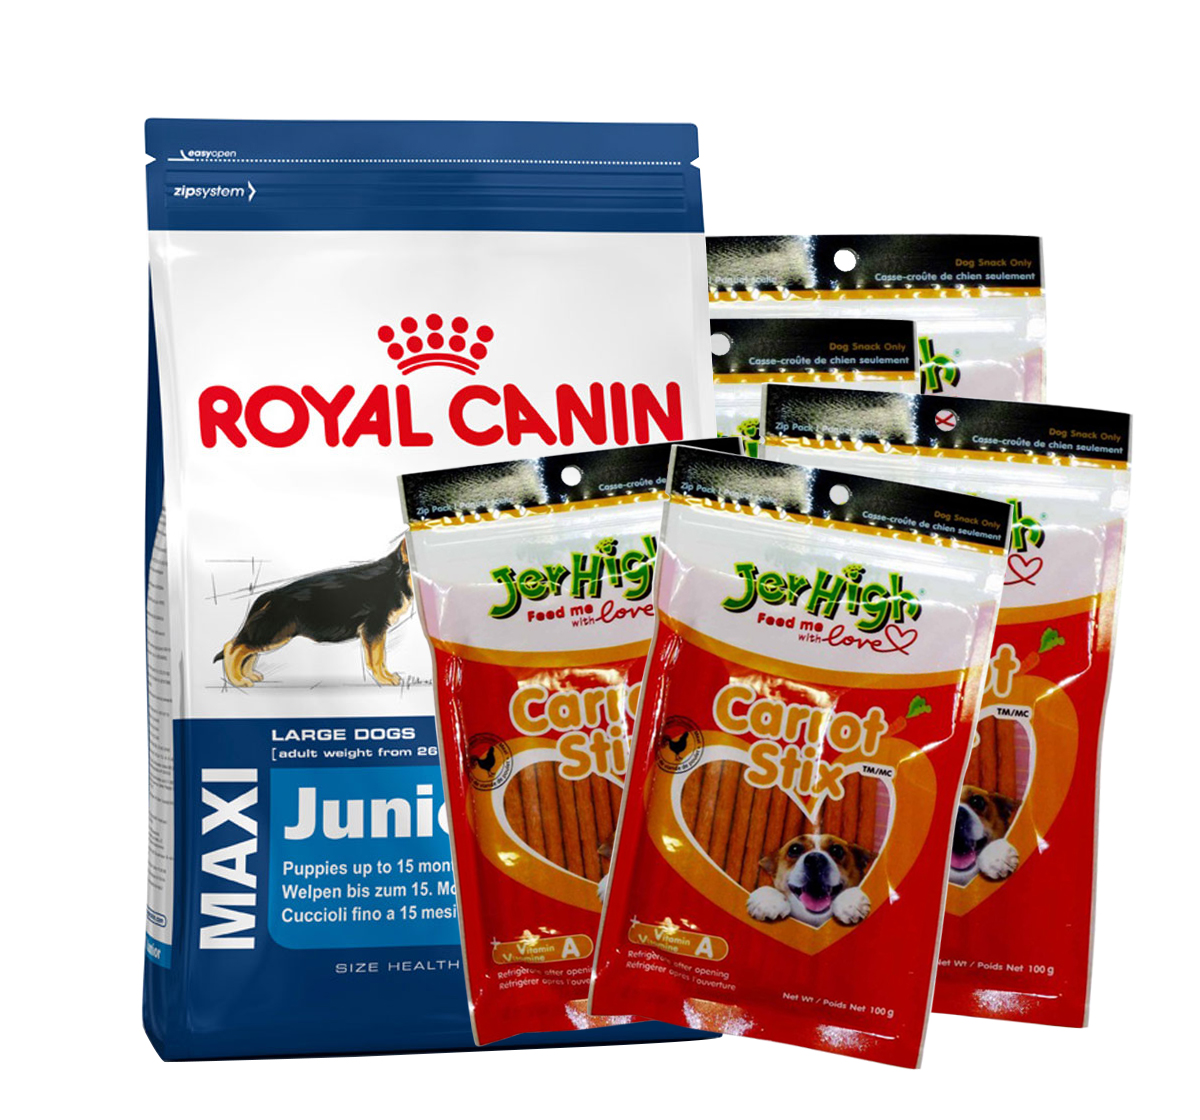 Royal Canin Maxi Junior - 4 Kg With JerHigh Carrot Stick Dog Treats